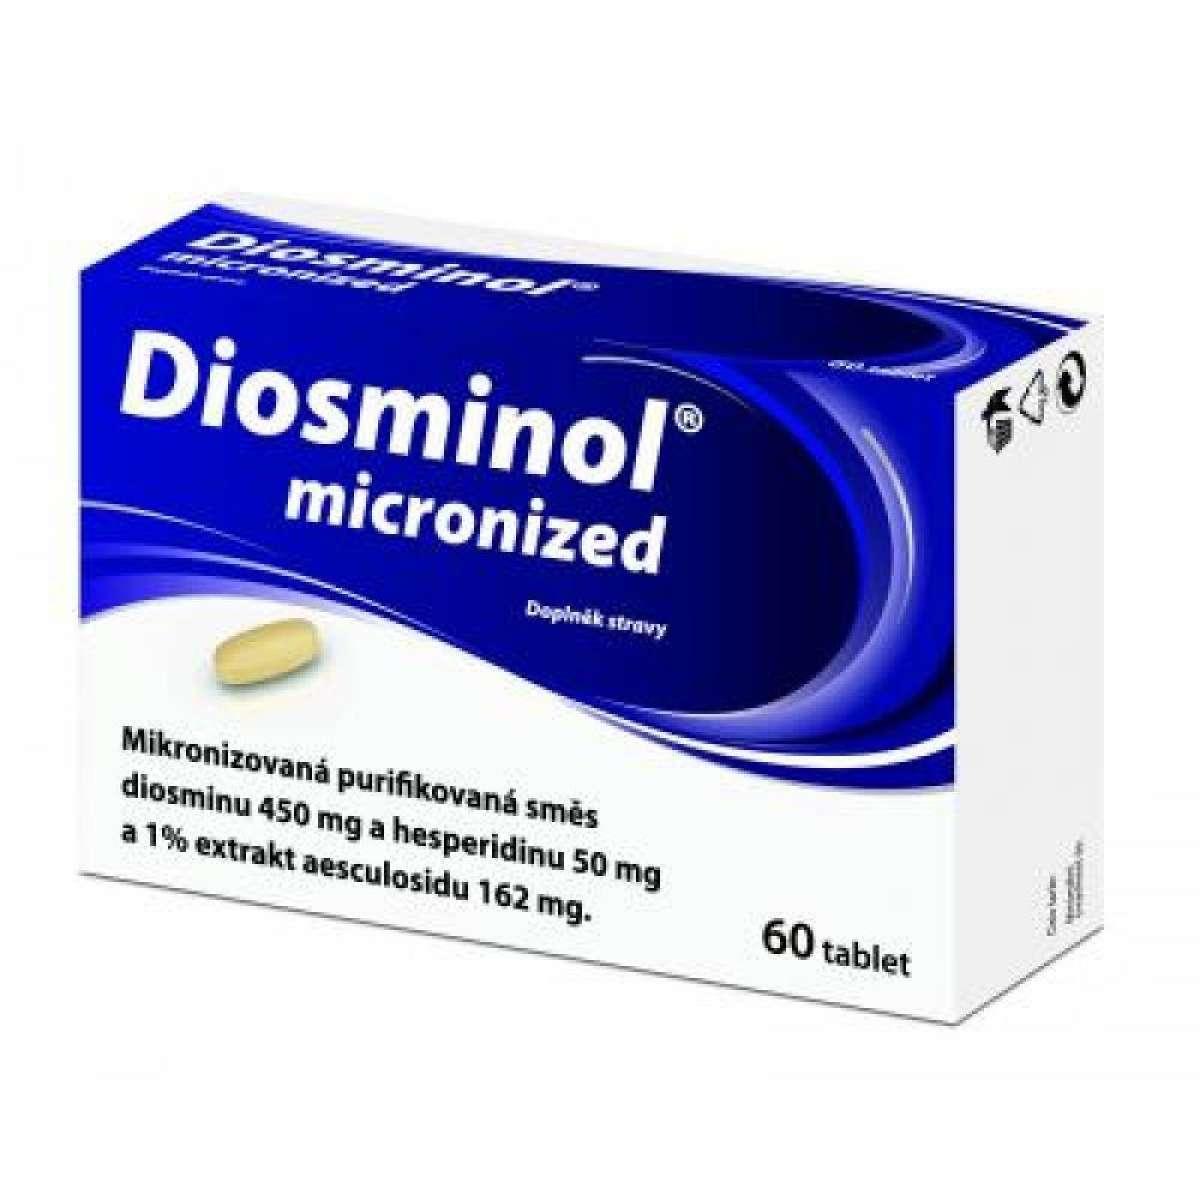 DIOSMINOL Micronized 60 tbl.